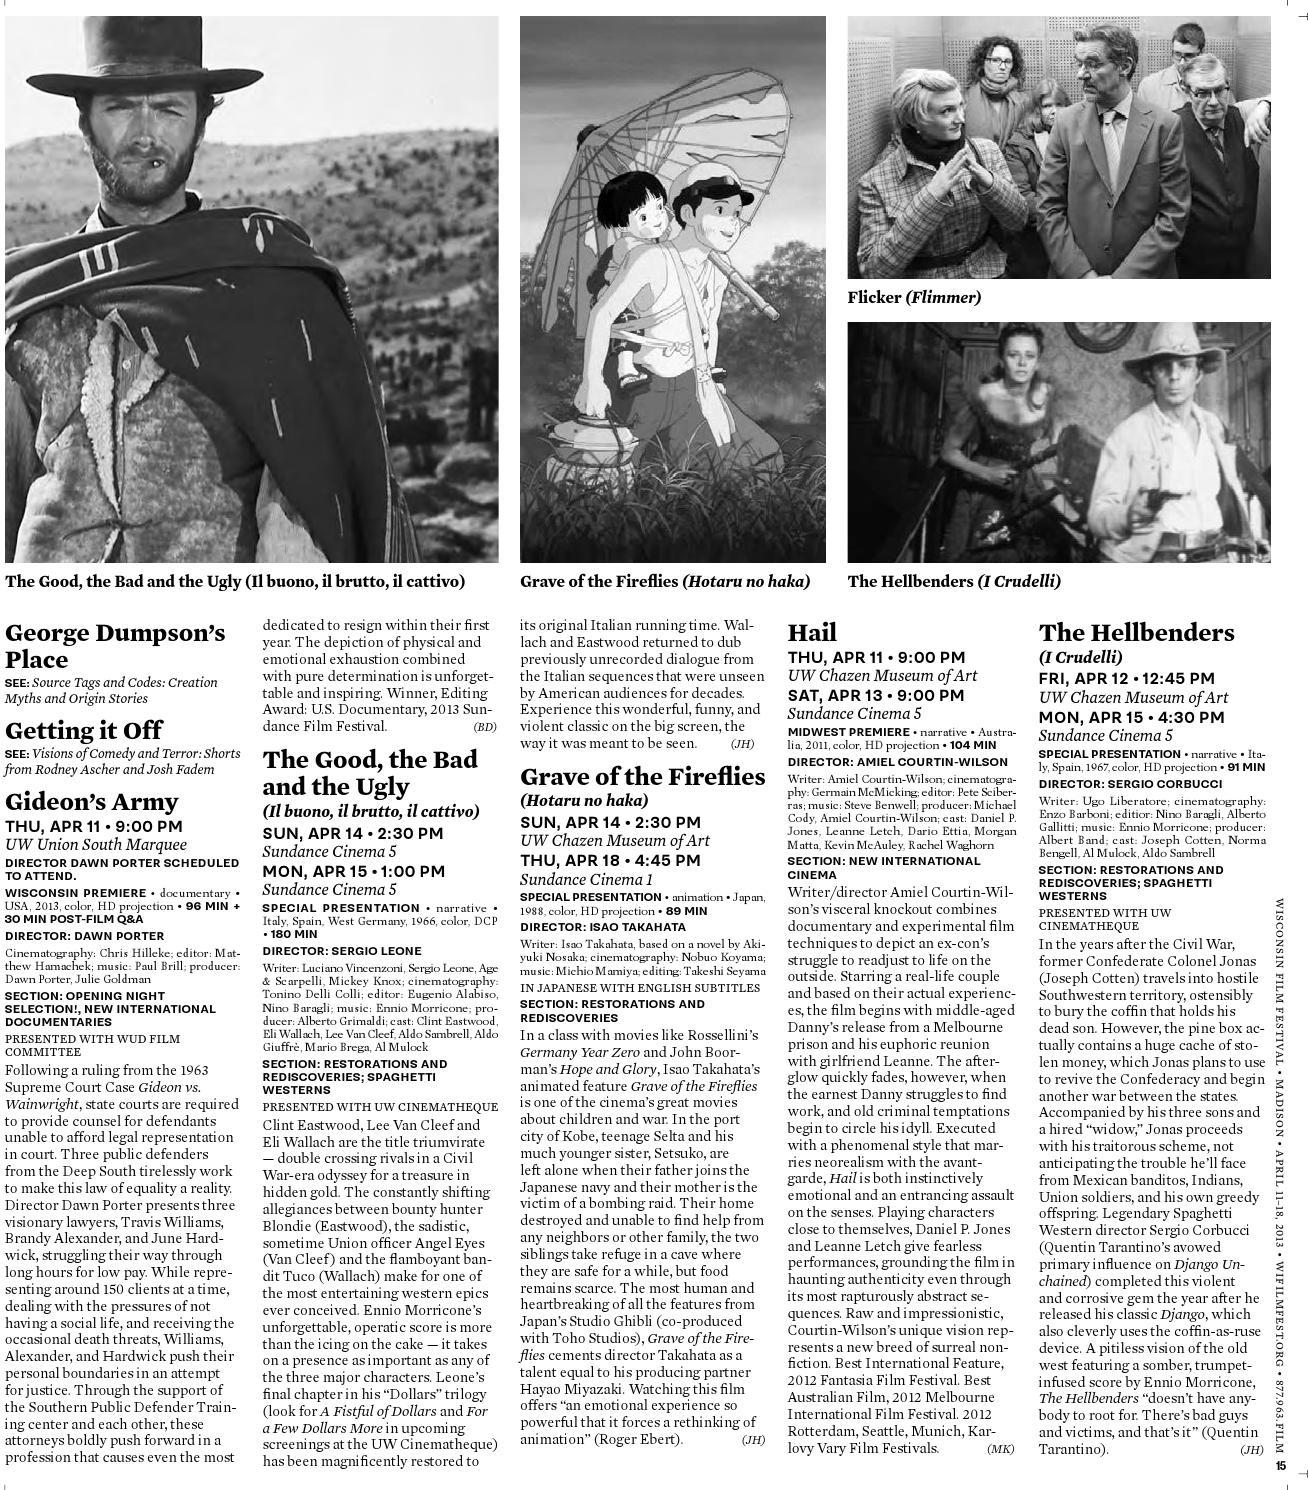 2013 Wisconsin Film Festival Film Guide